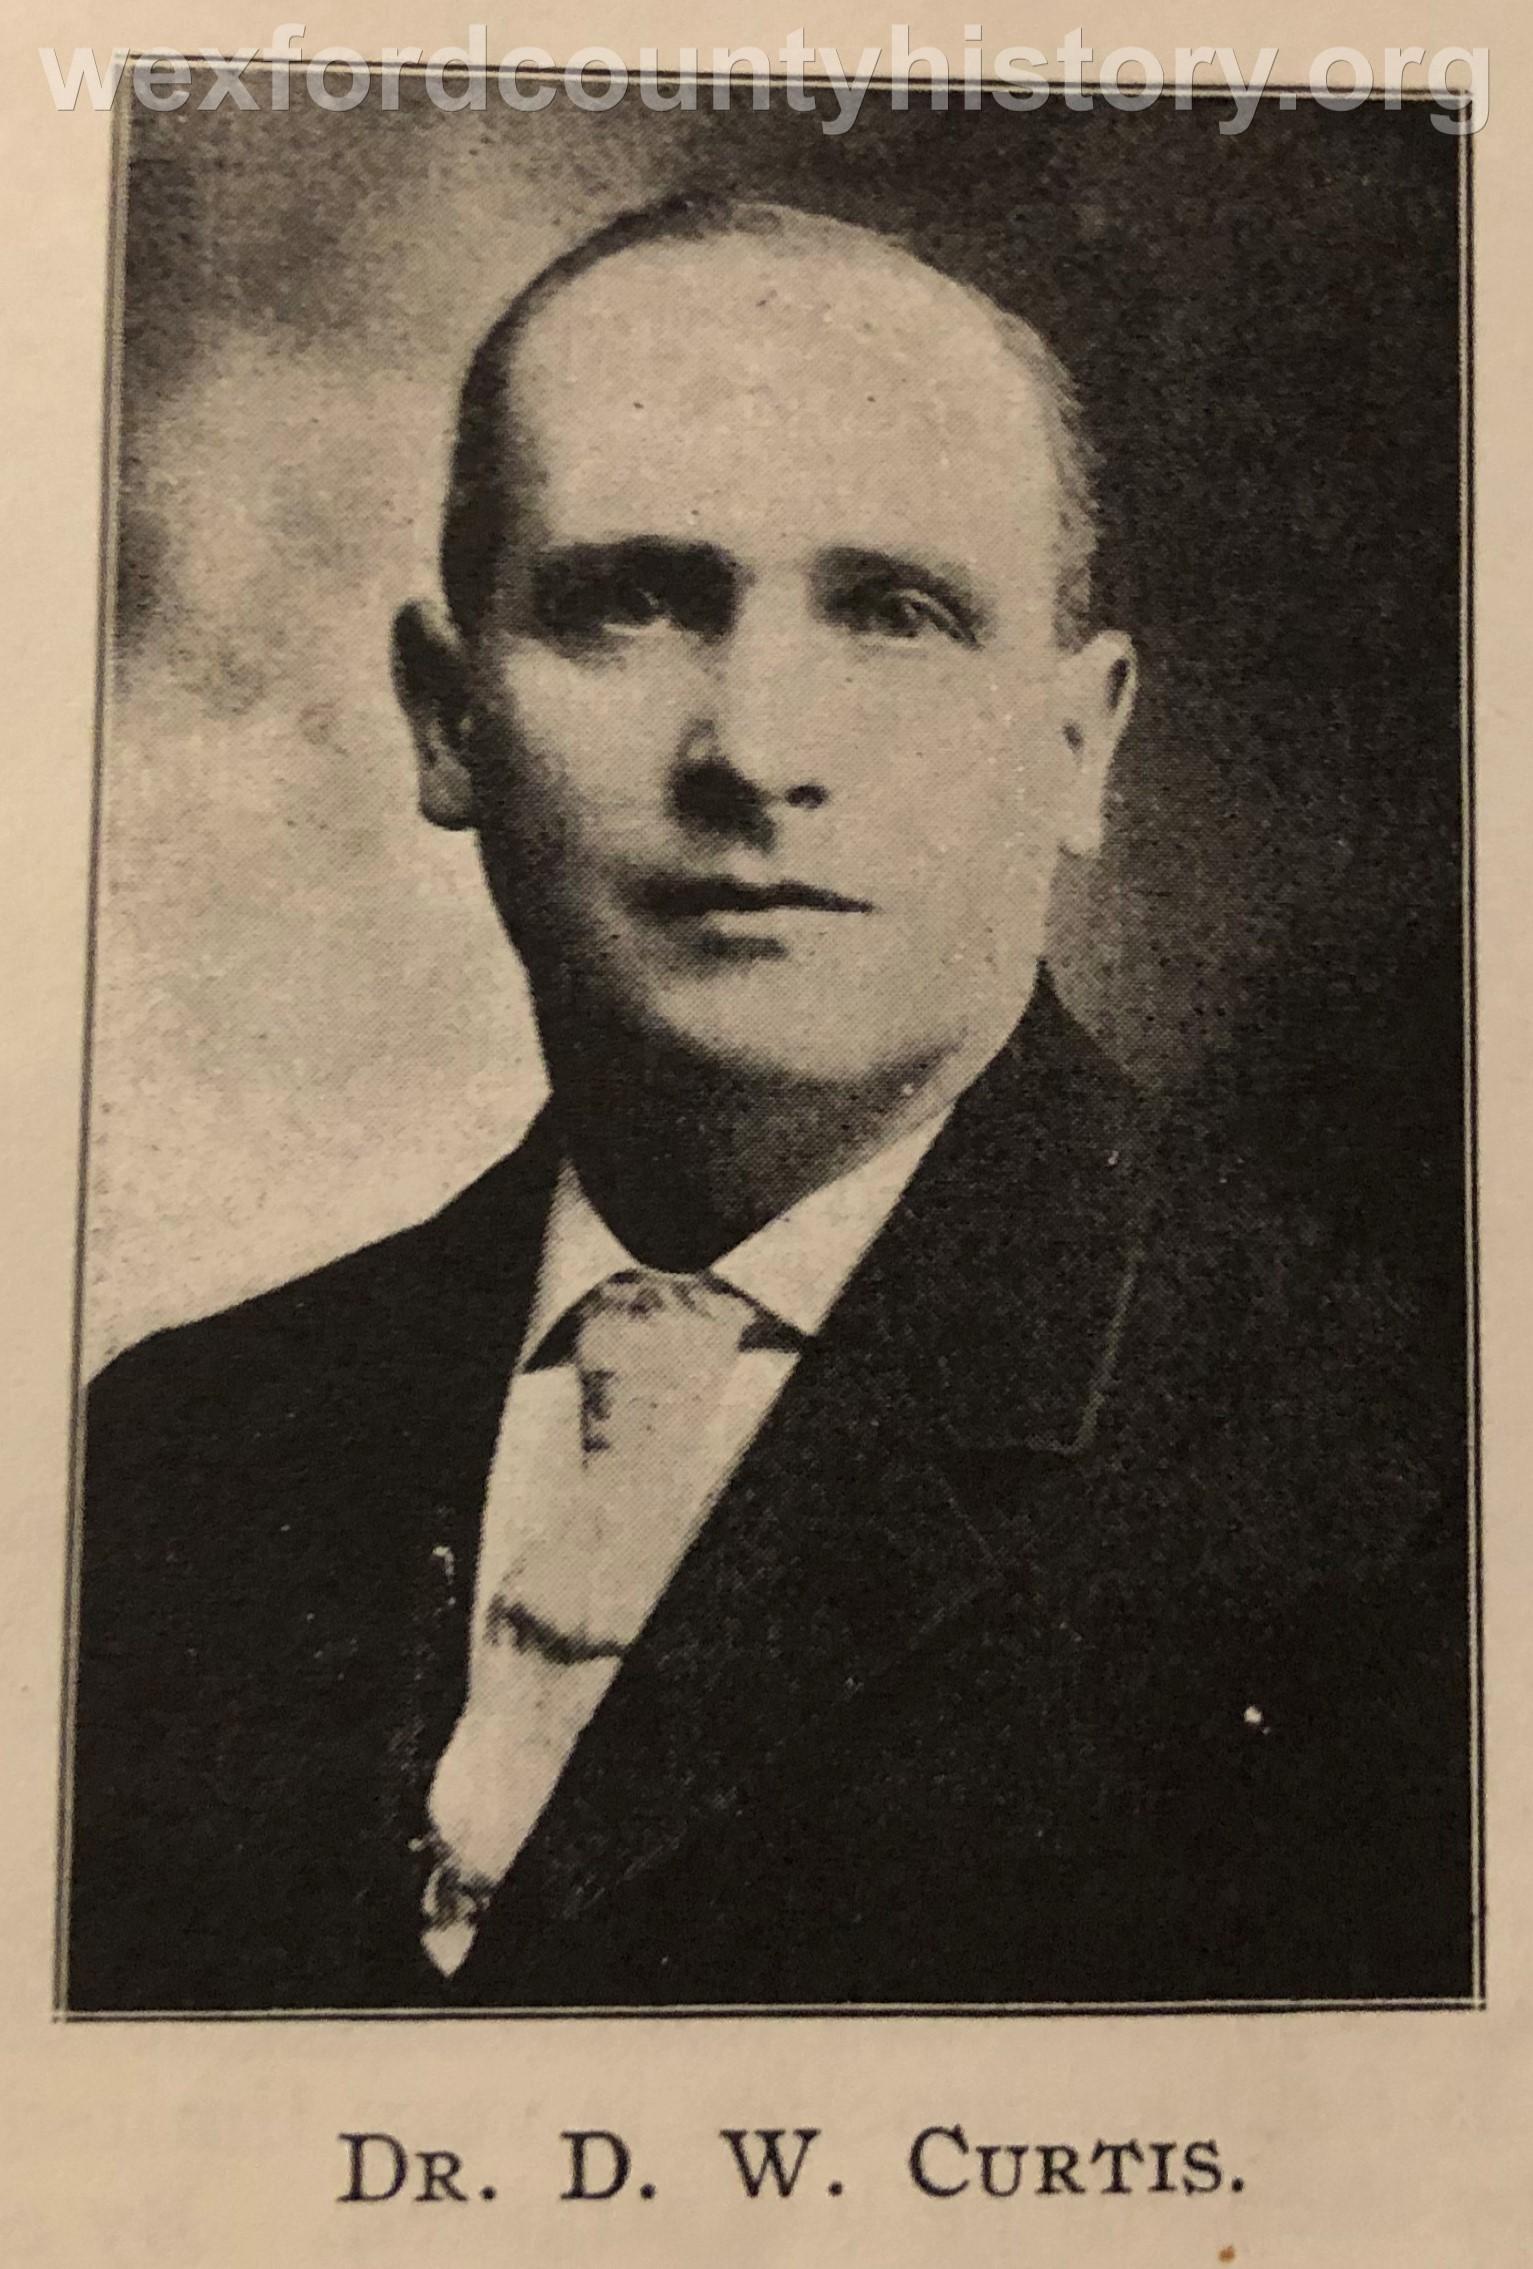 Dr. D. W. Curtis